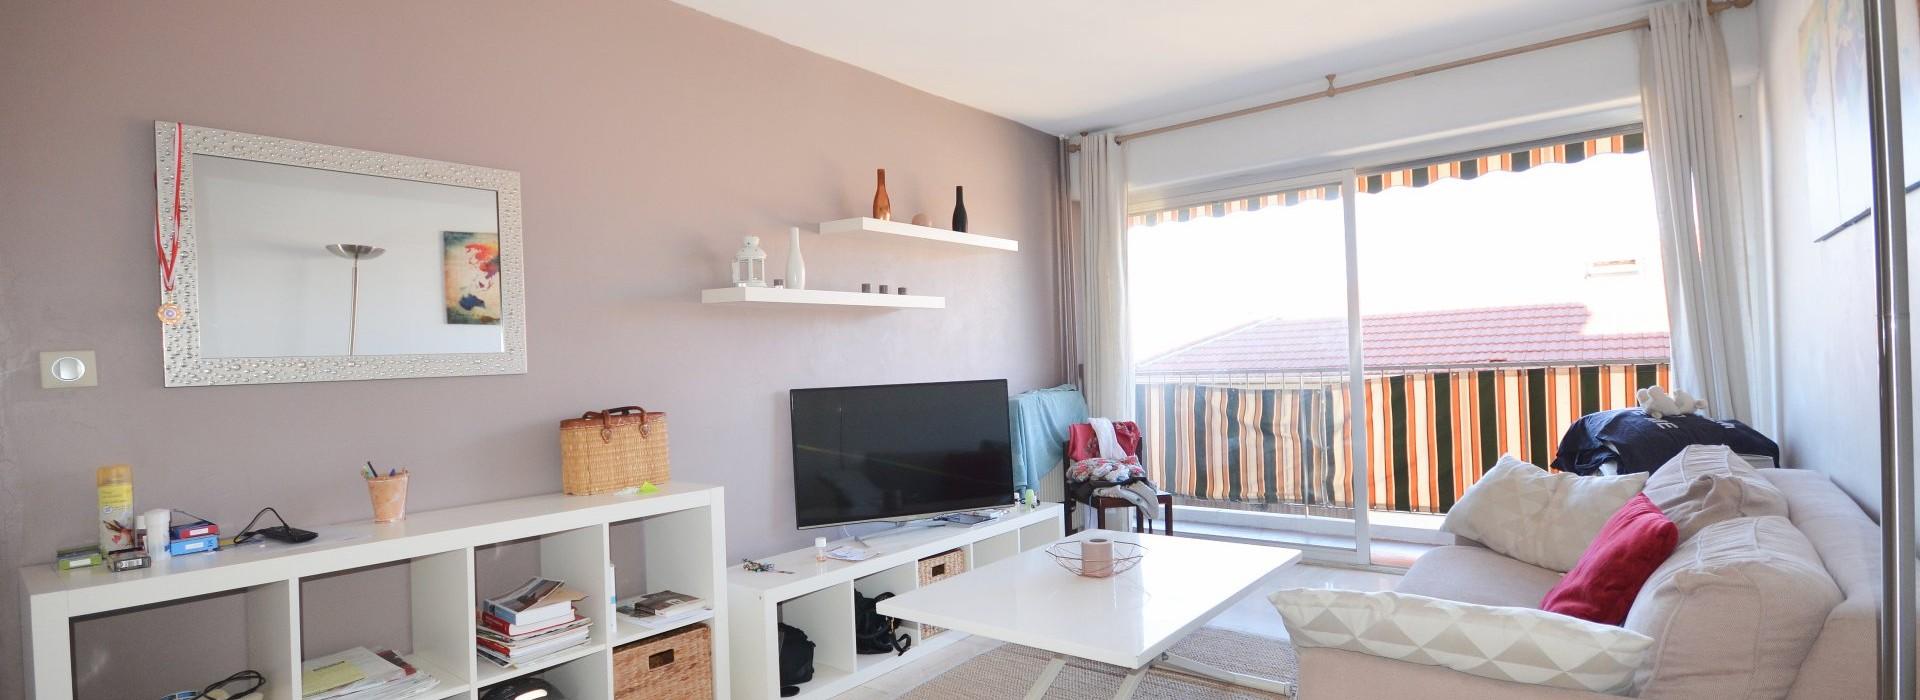 Appartement Nice 1 Pièce 34m2 155,000€